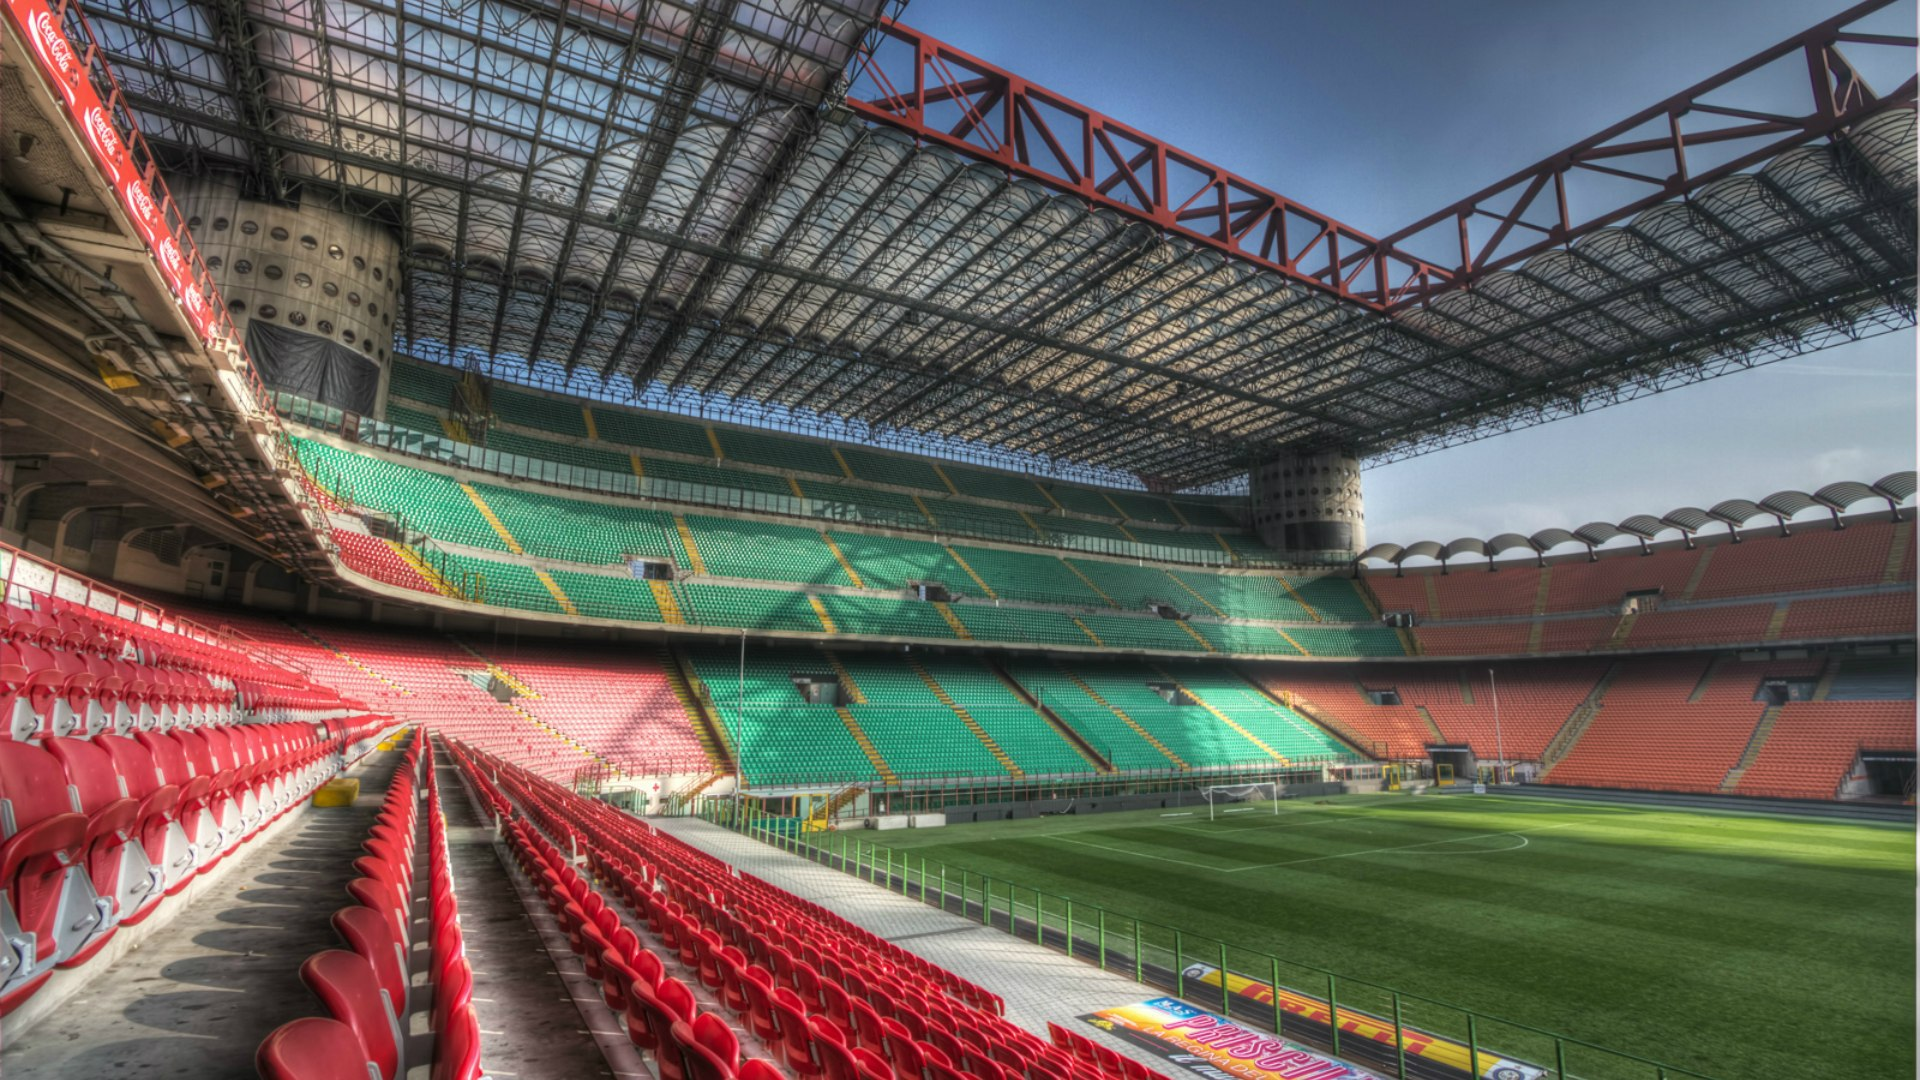 Cities_Milan_San_Siro_stadium_095694_